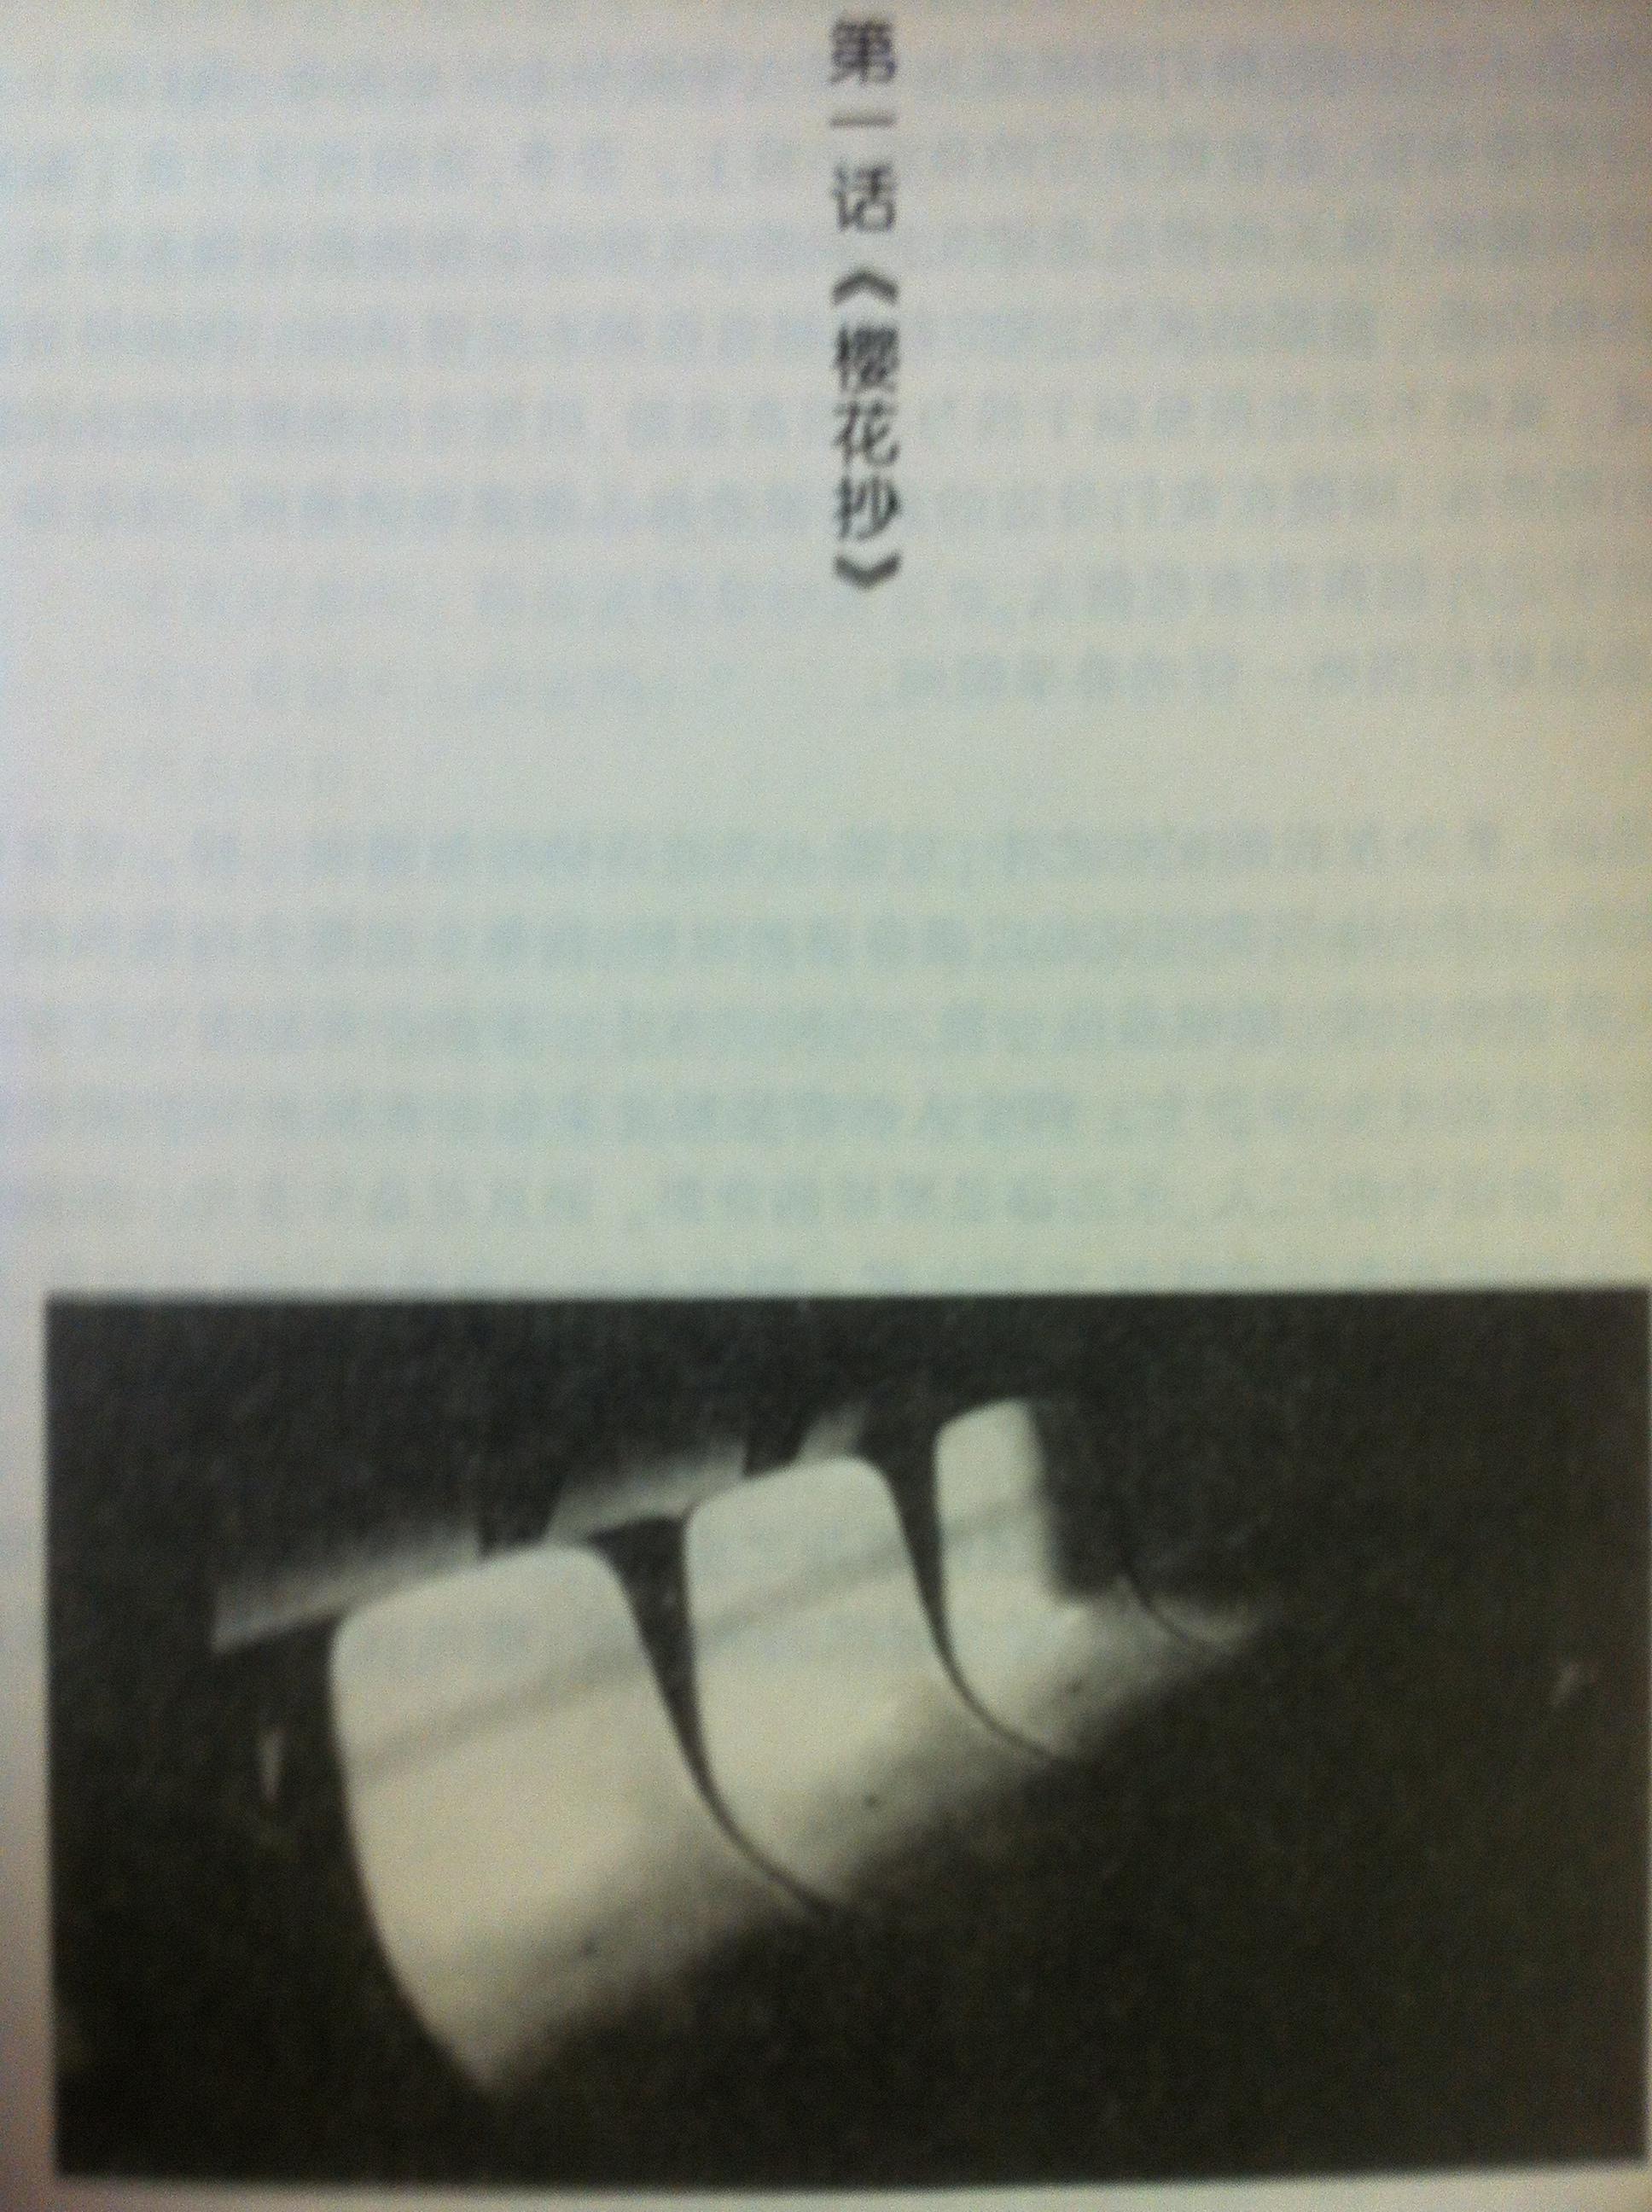 5cm/s, Đoản khúc anh đào novel illustration